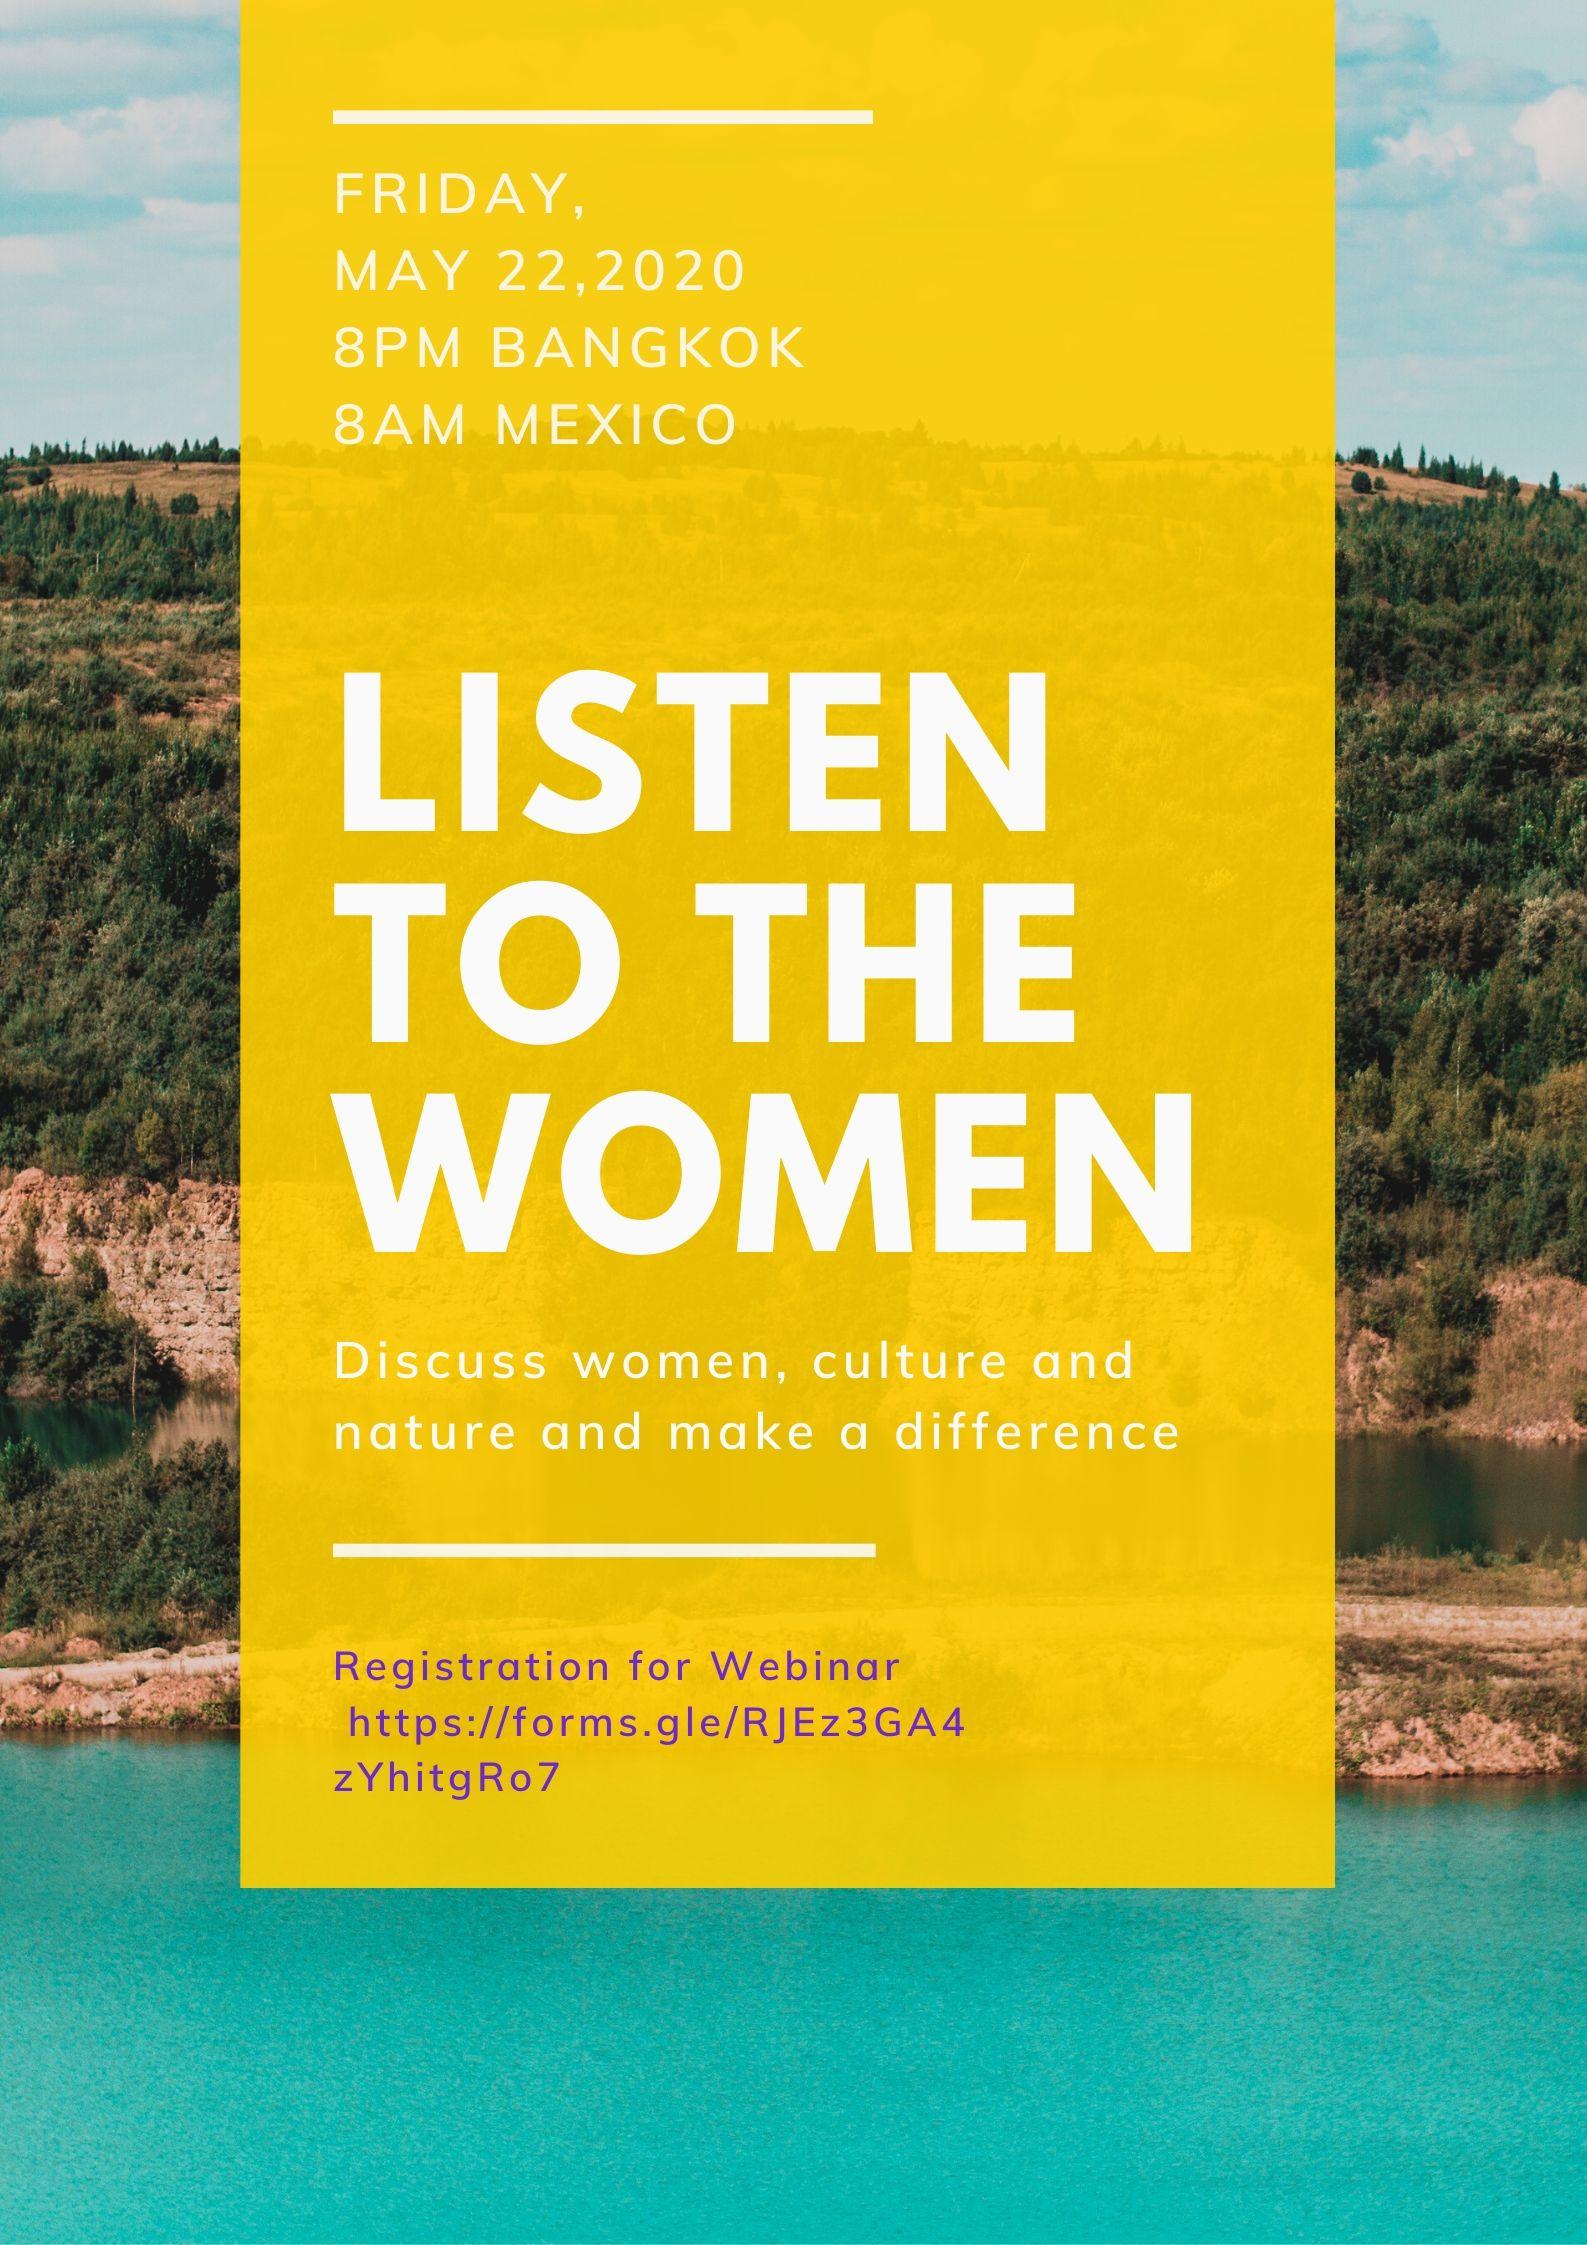 LISTEN TO THE WOMEN